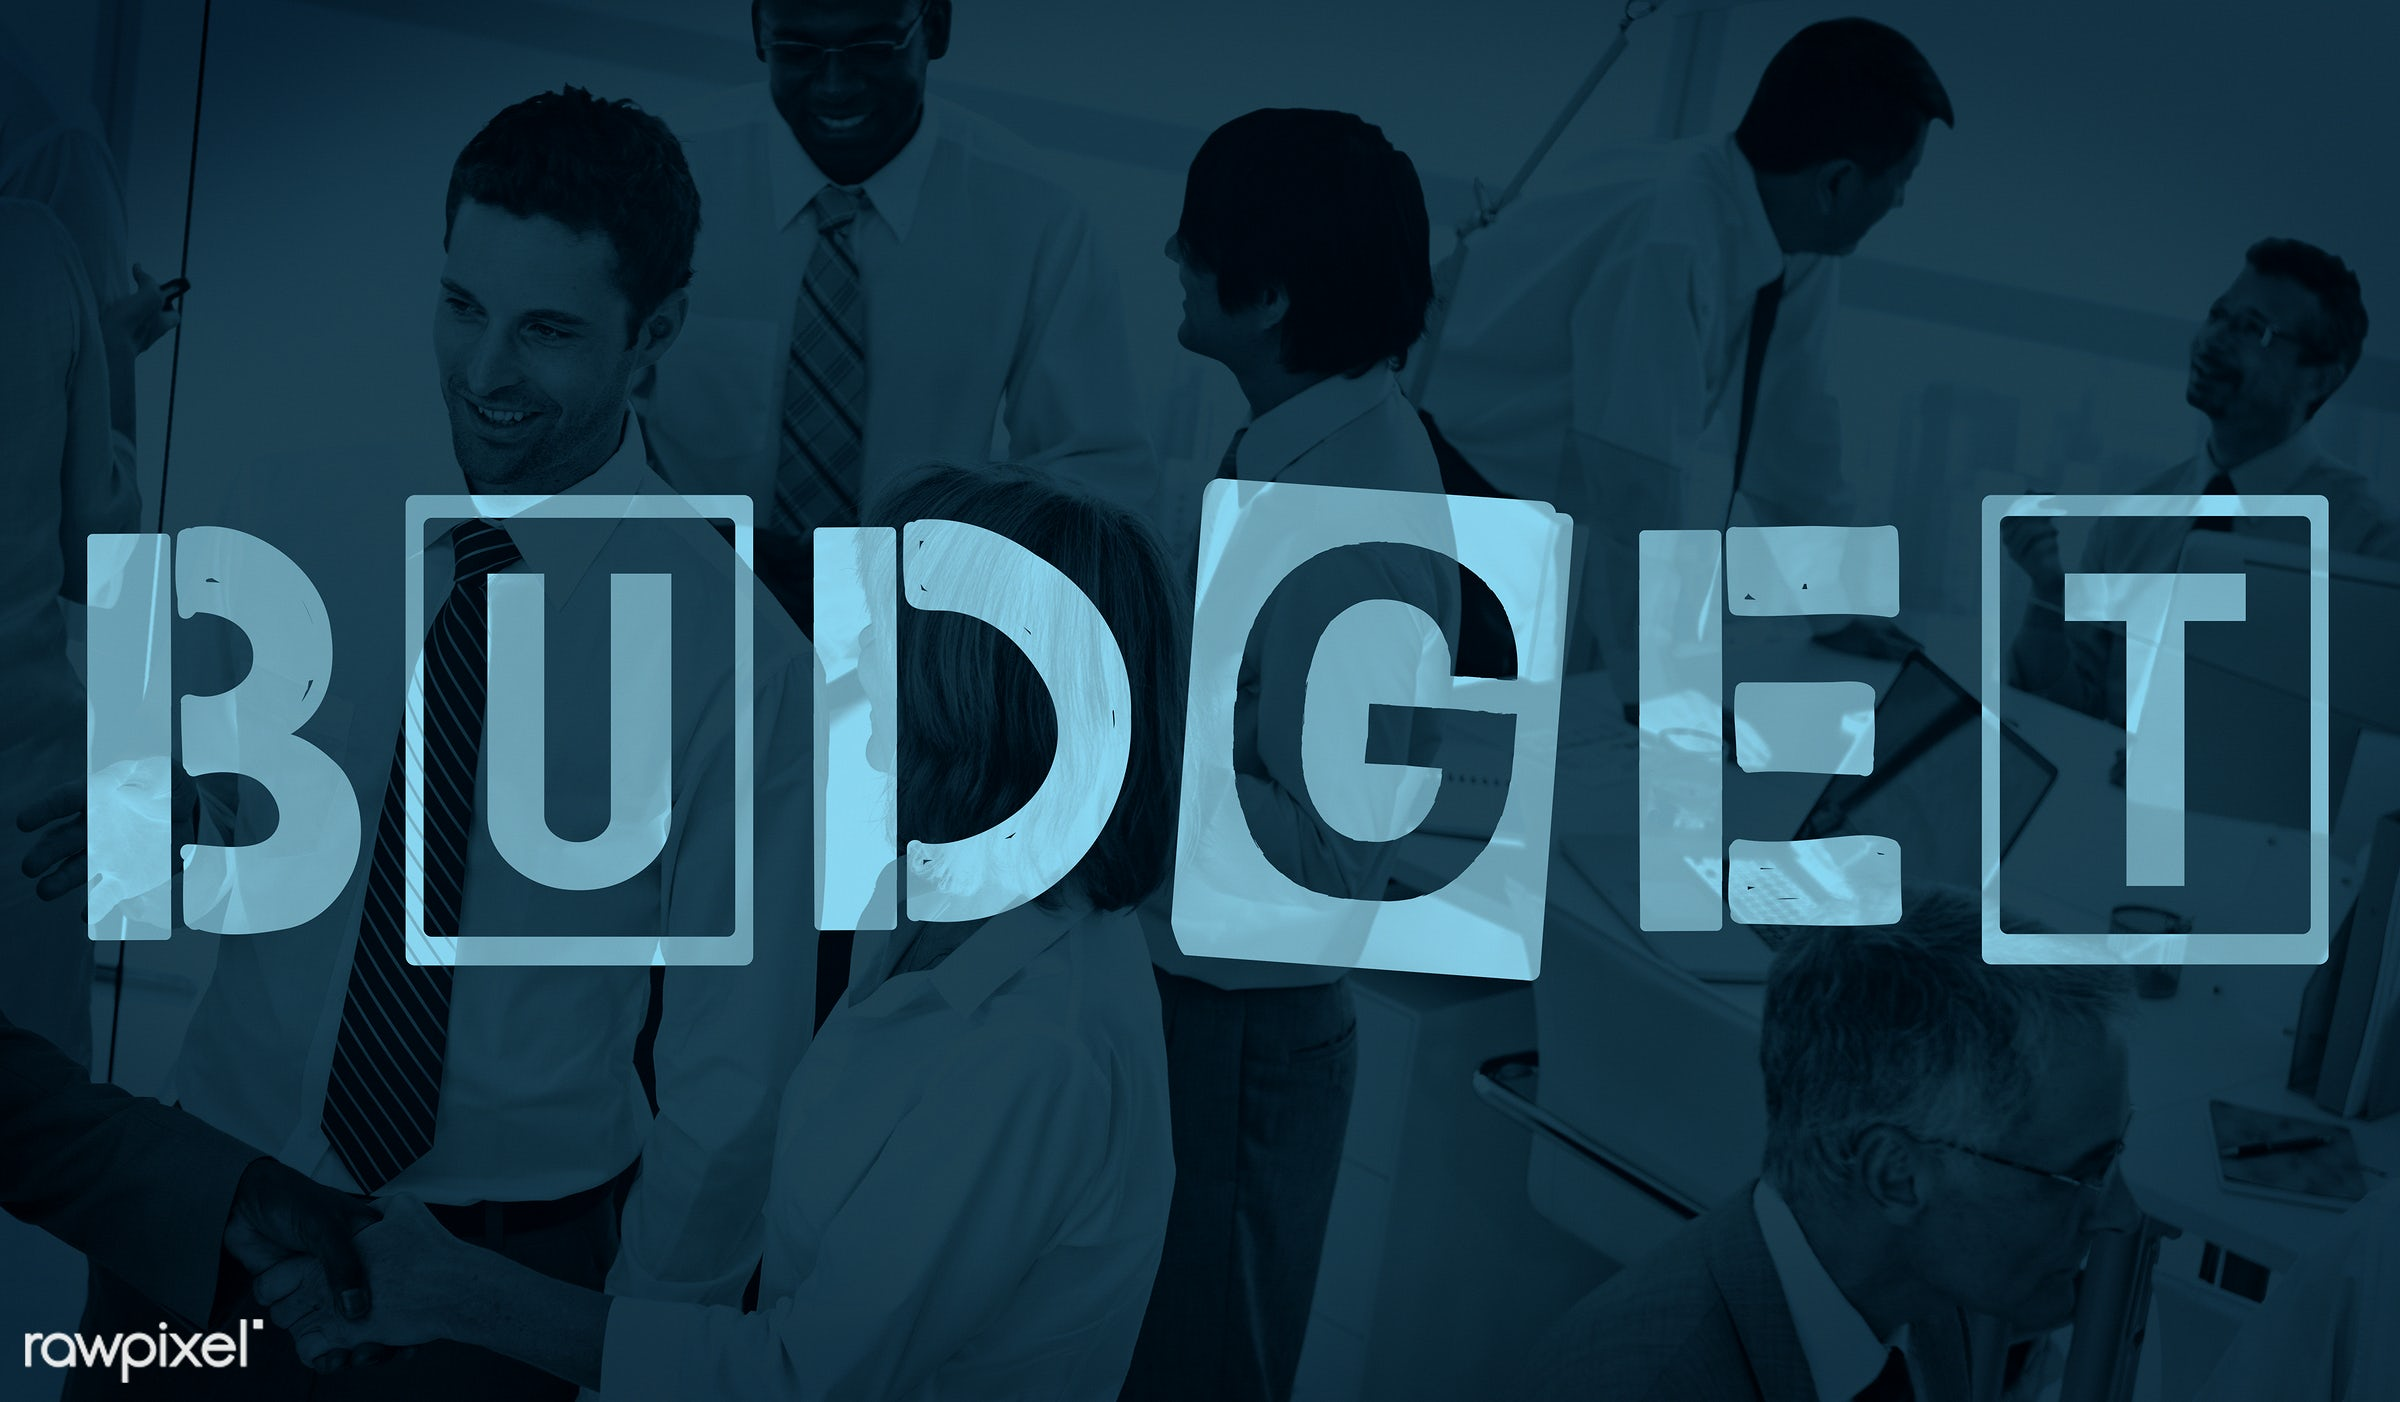 accounting, african descent, analysis, asian ethnicity, audit, banking, budget, business, businessmen, businesswomen, cash,...